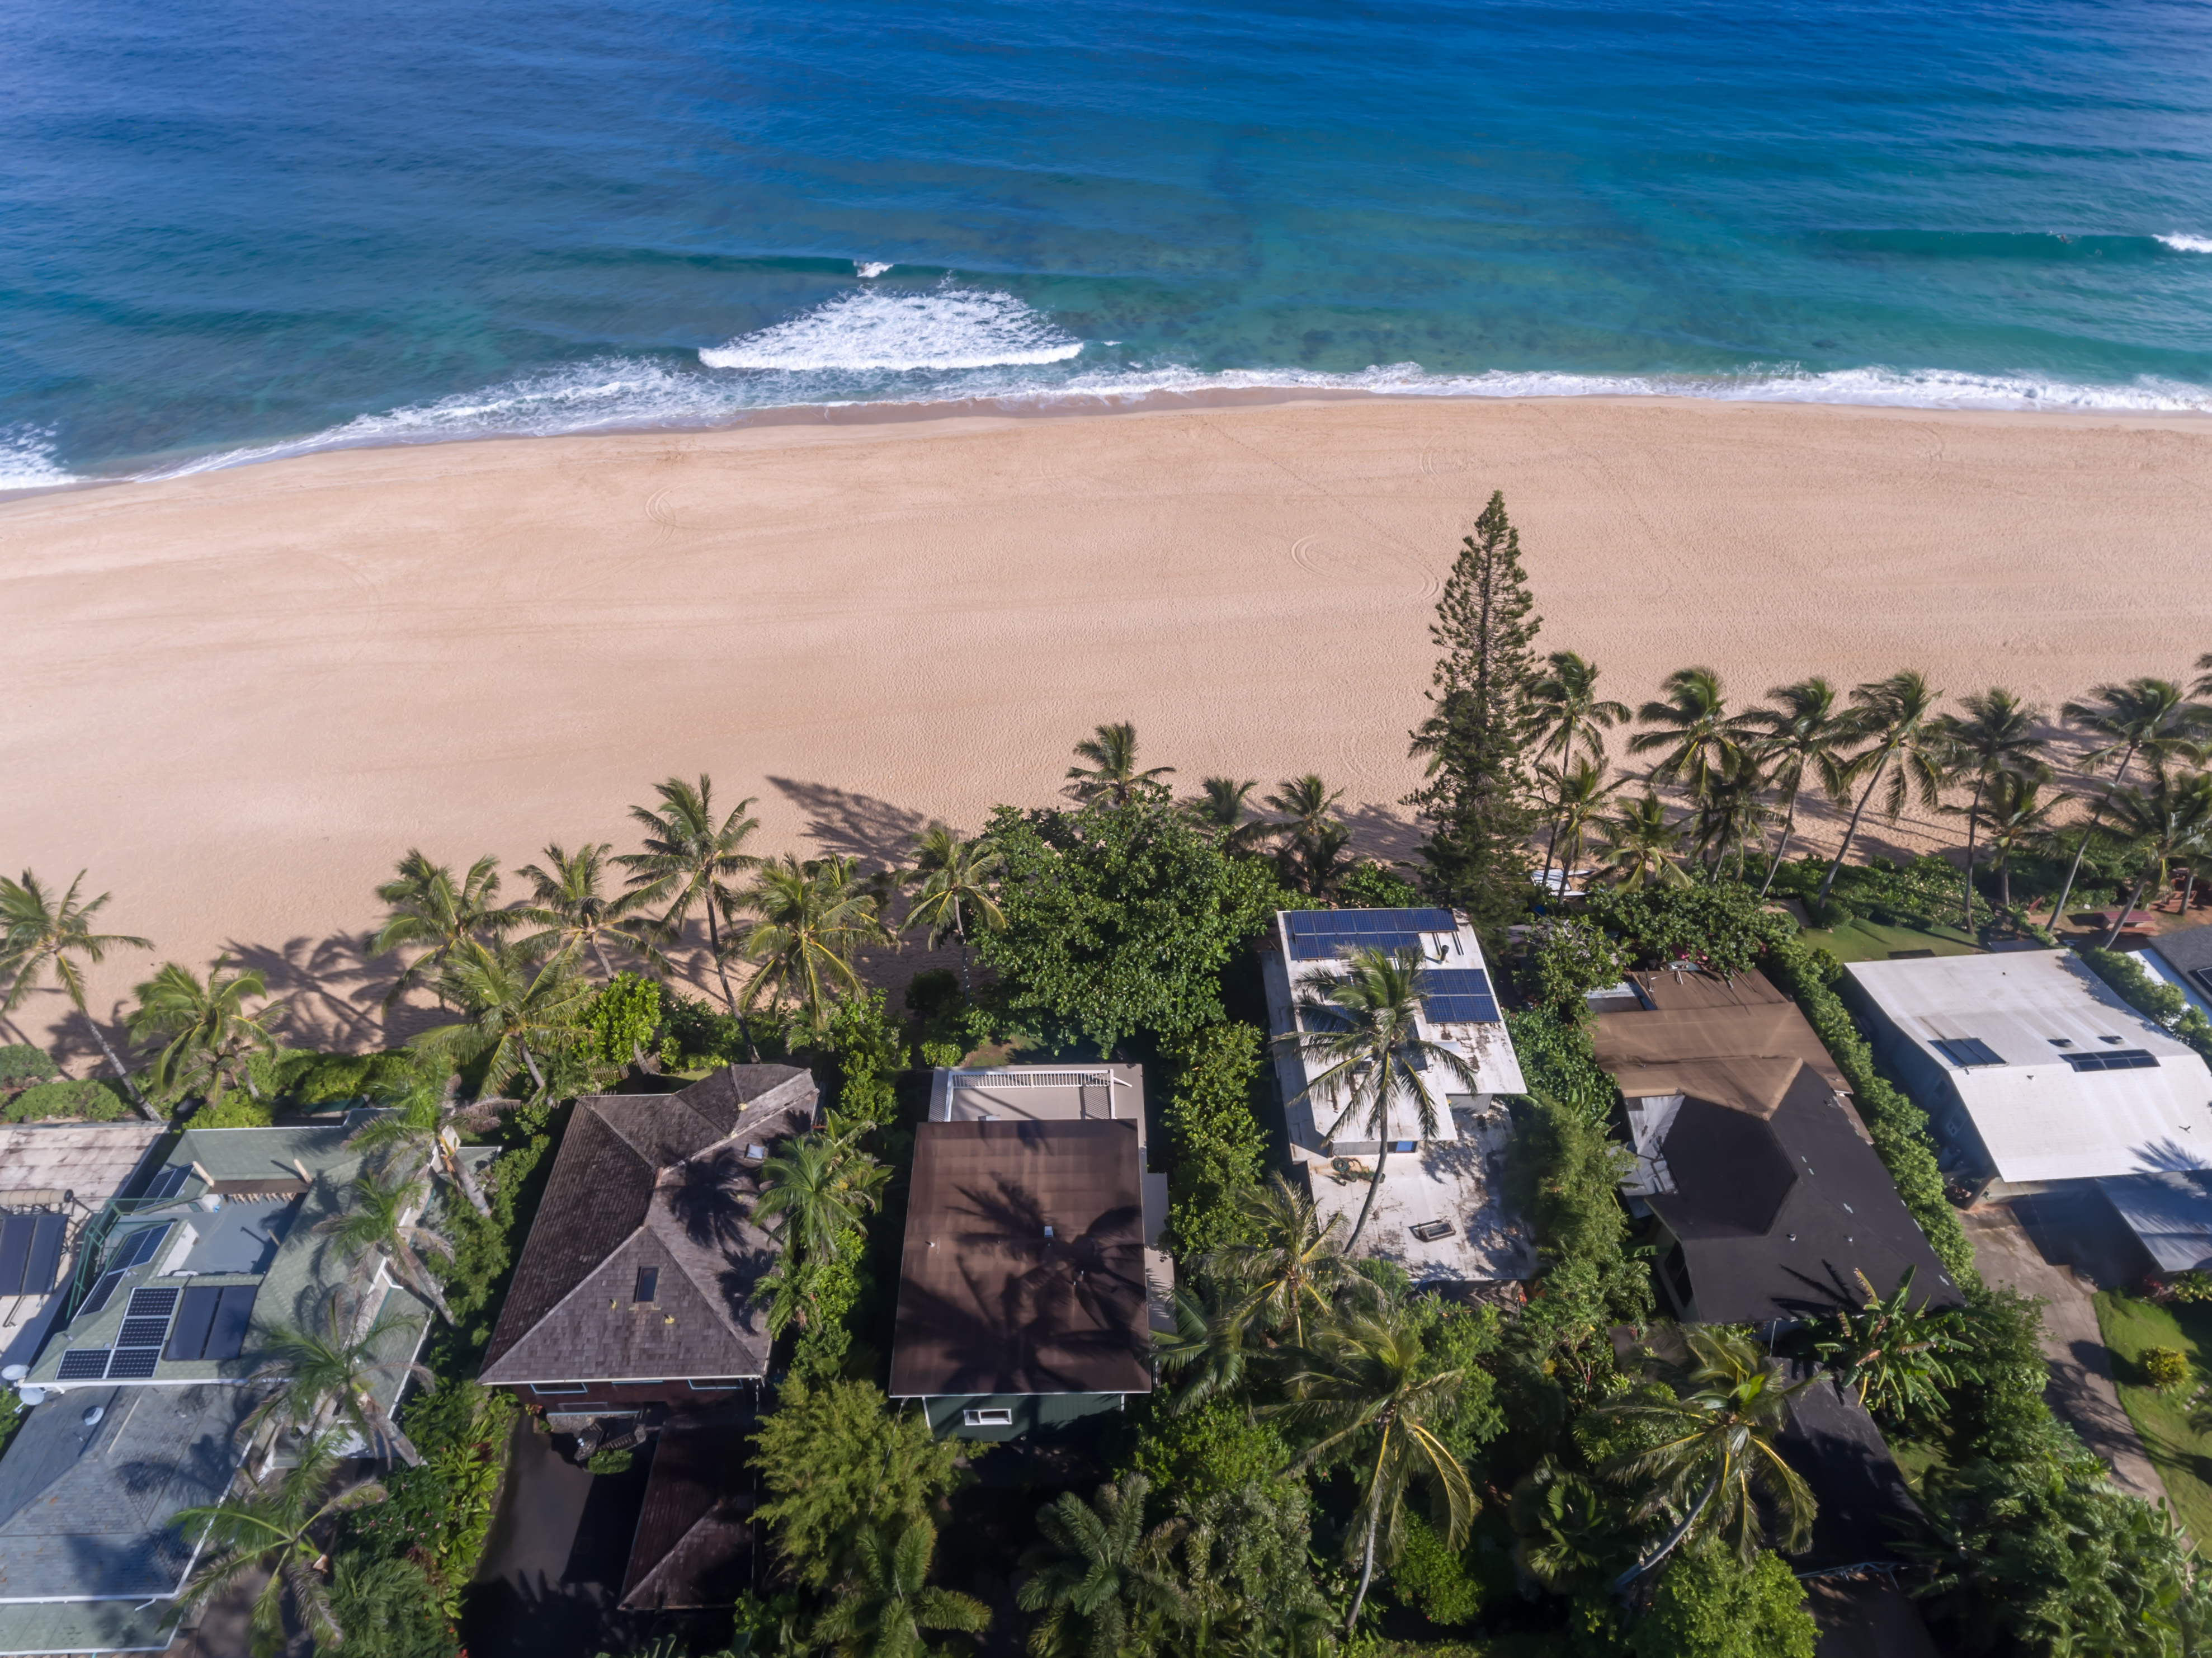 Aerial view of Ocean Front homes in Hawaii